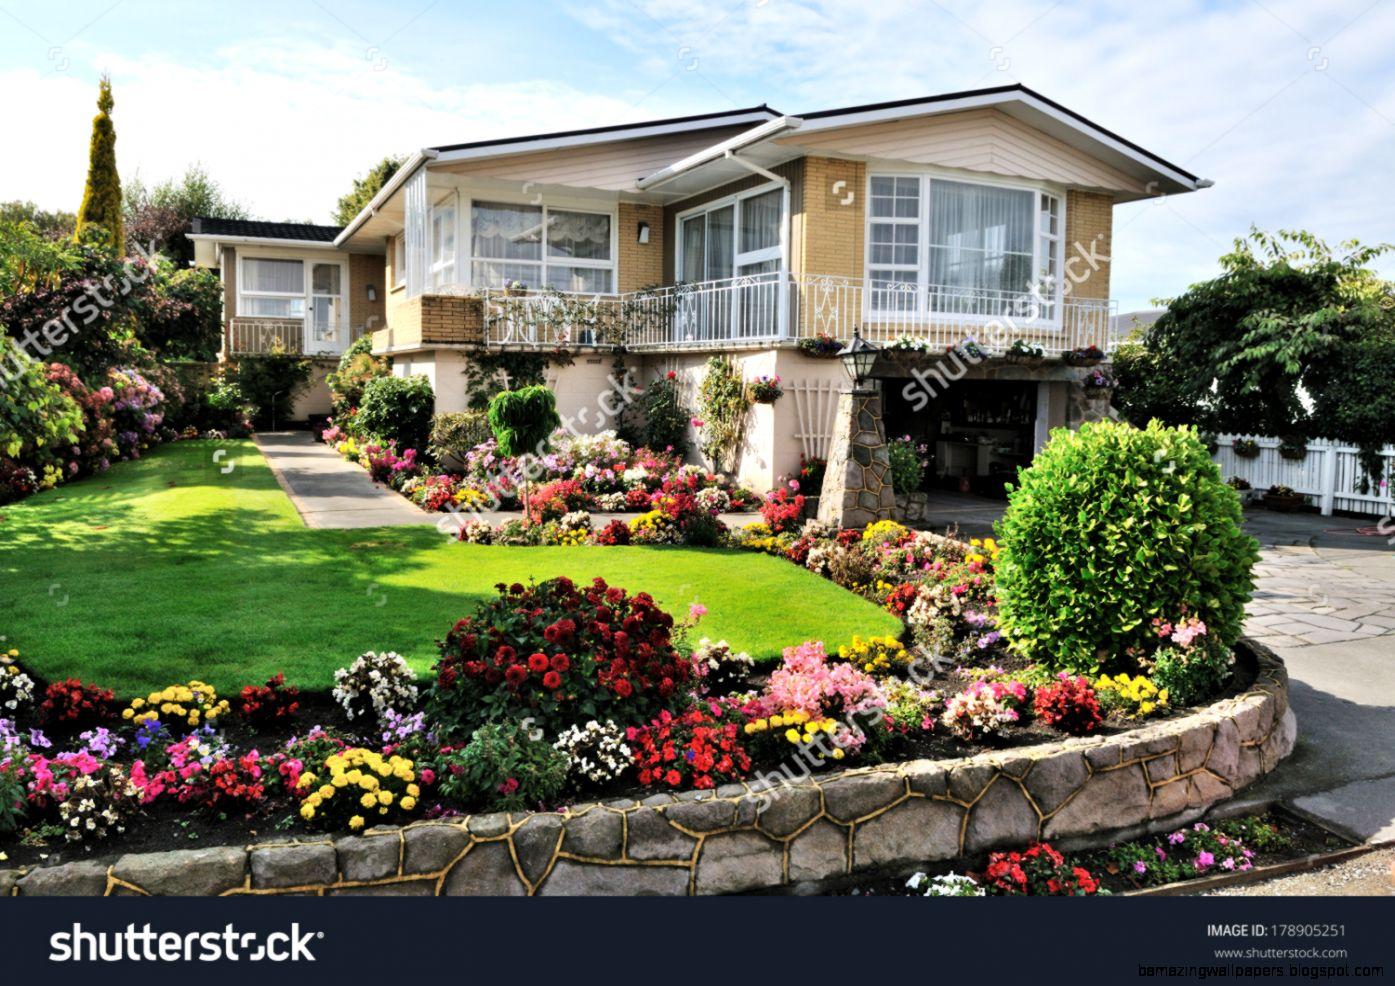 Beautiful Flowers Garden House Amazing Wallpapers